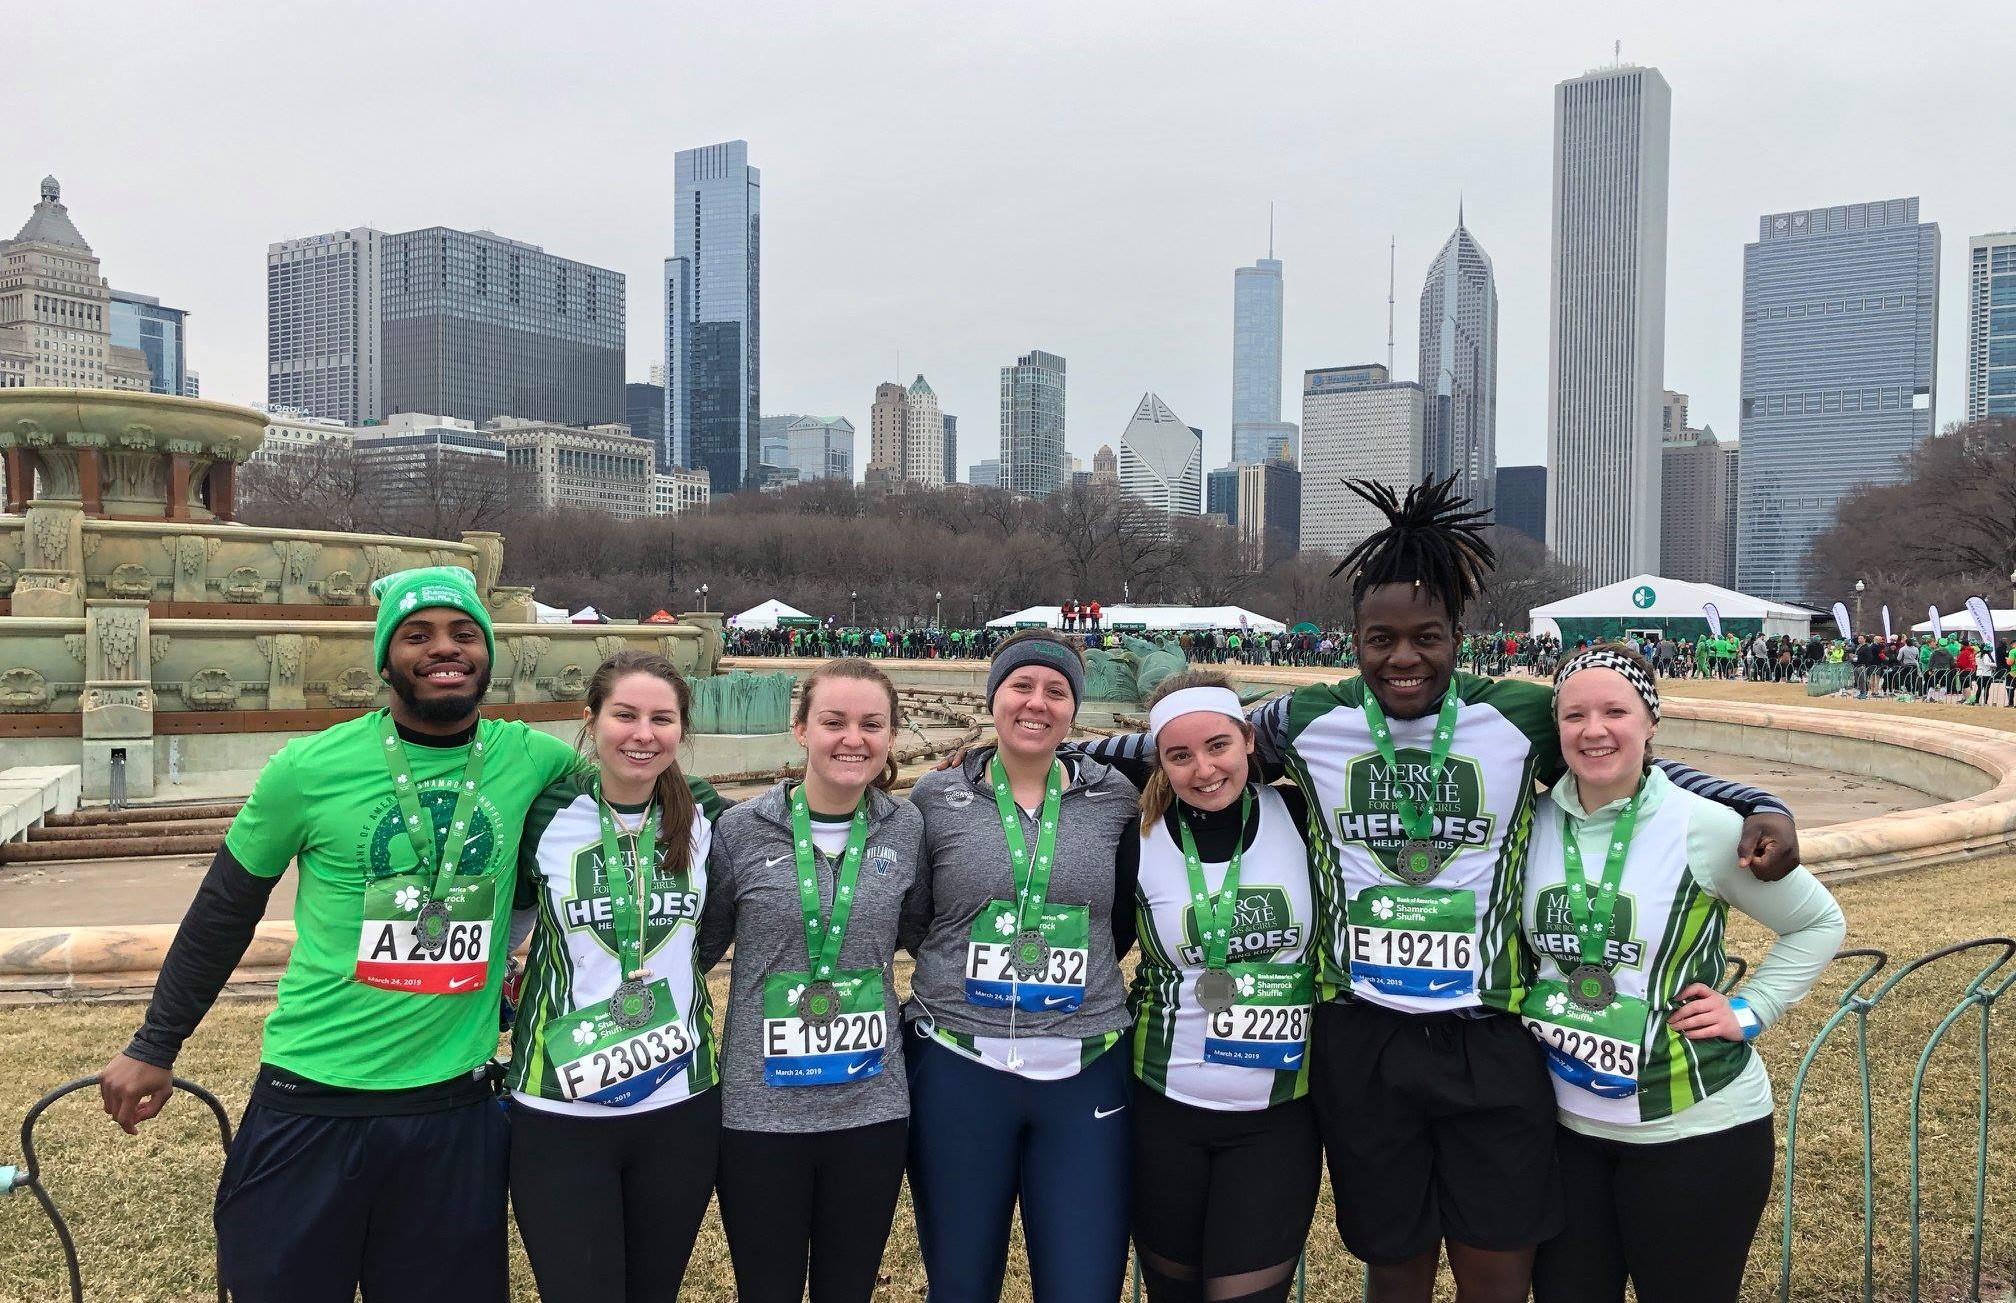 Mercy Home Heroes at Chicago Marathon